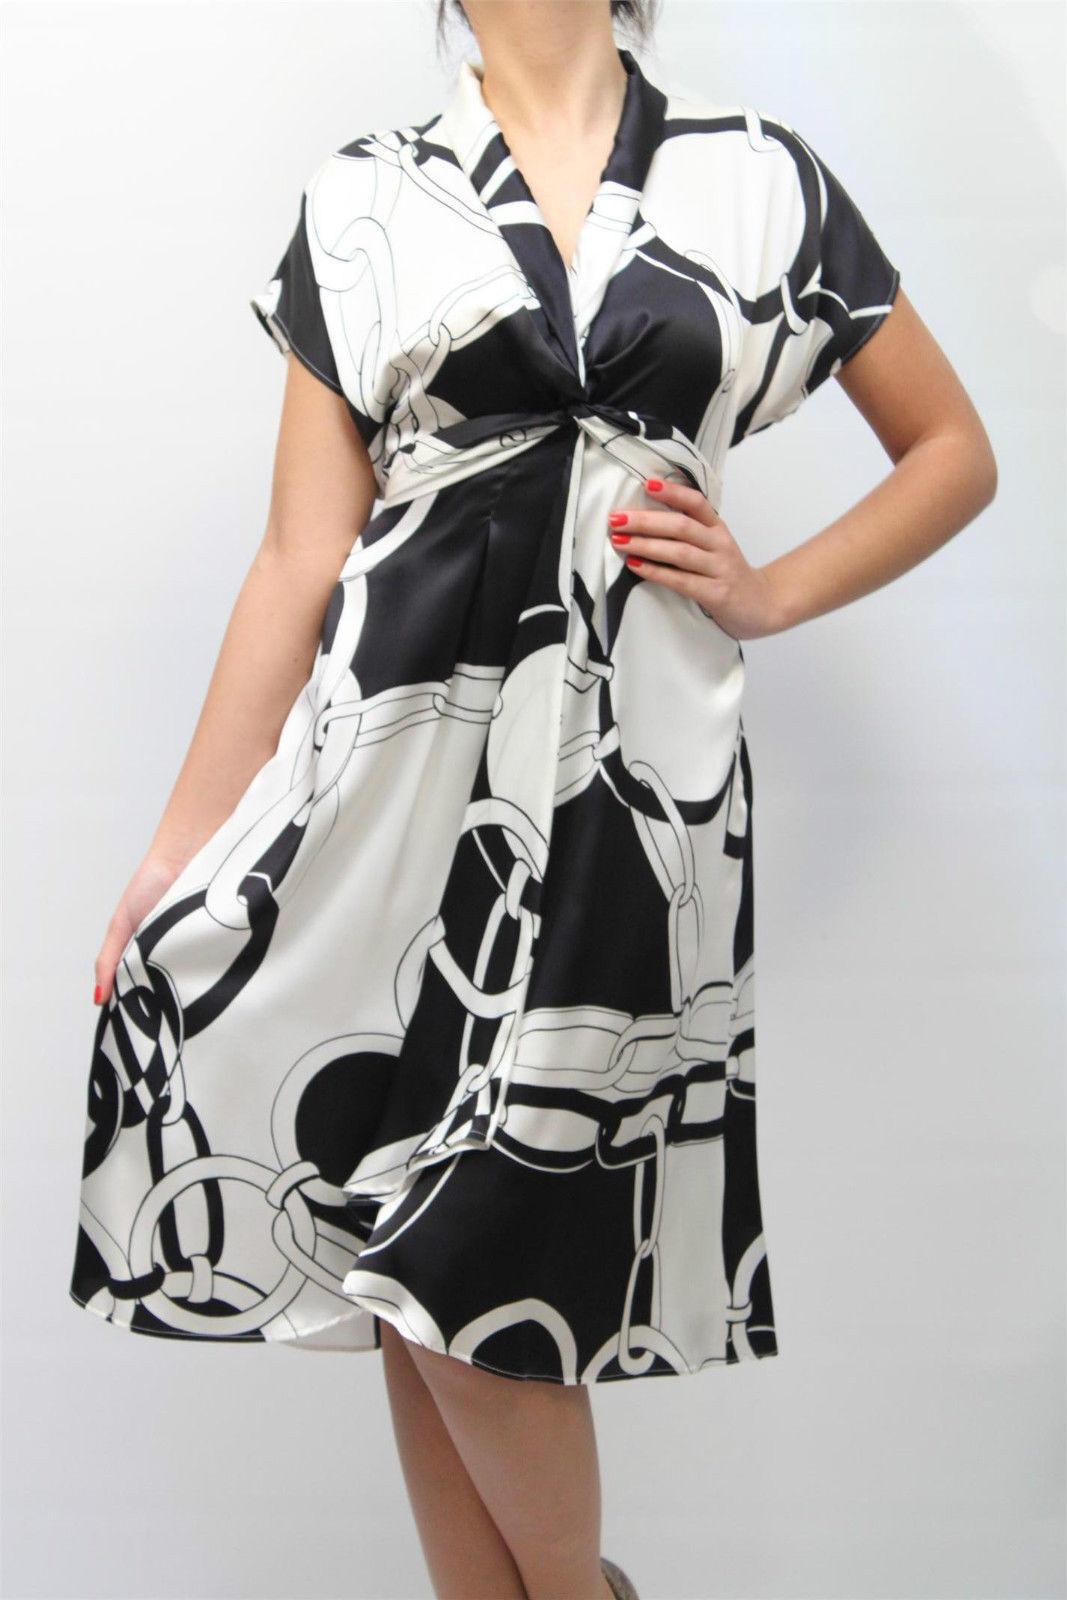 ABITO CLIPS women DRESS ПЛАТЬЕ 100% Seta,S11 H0803028 BIANCO black MIS.48 PP 11